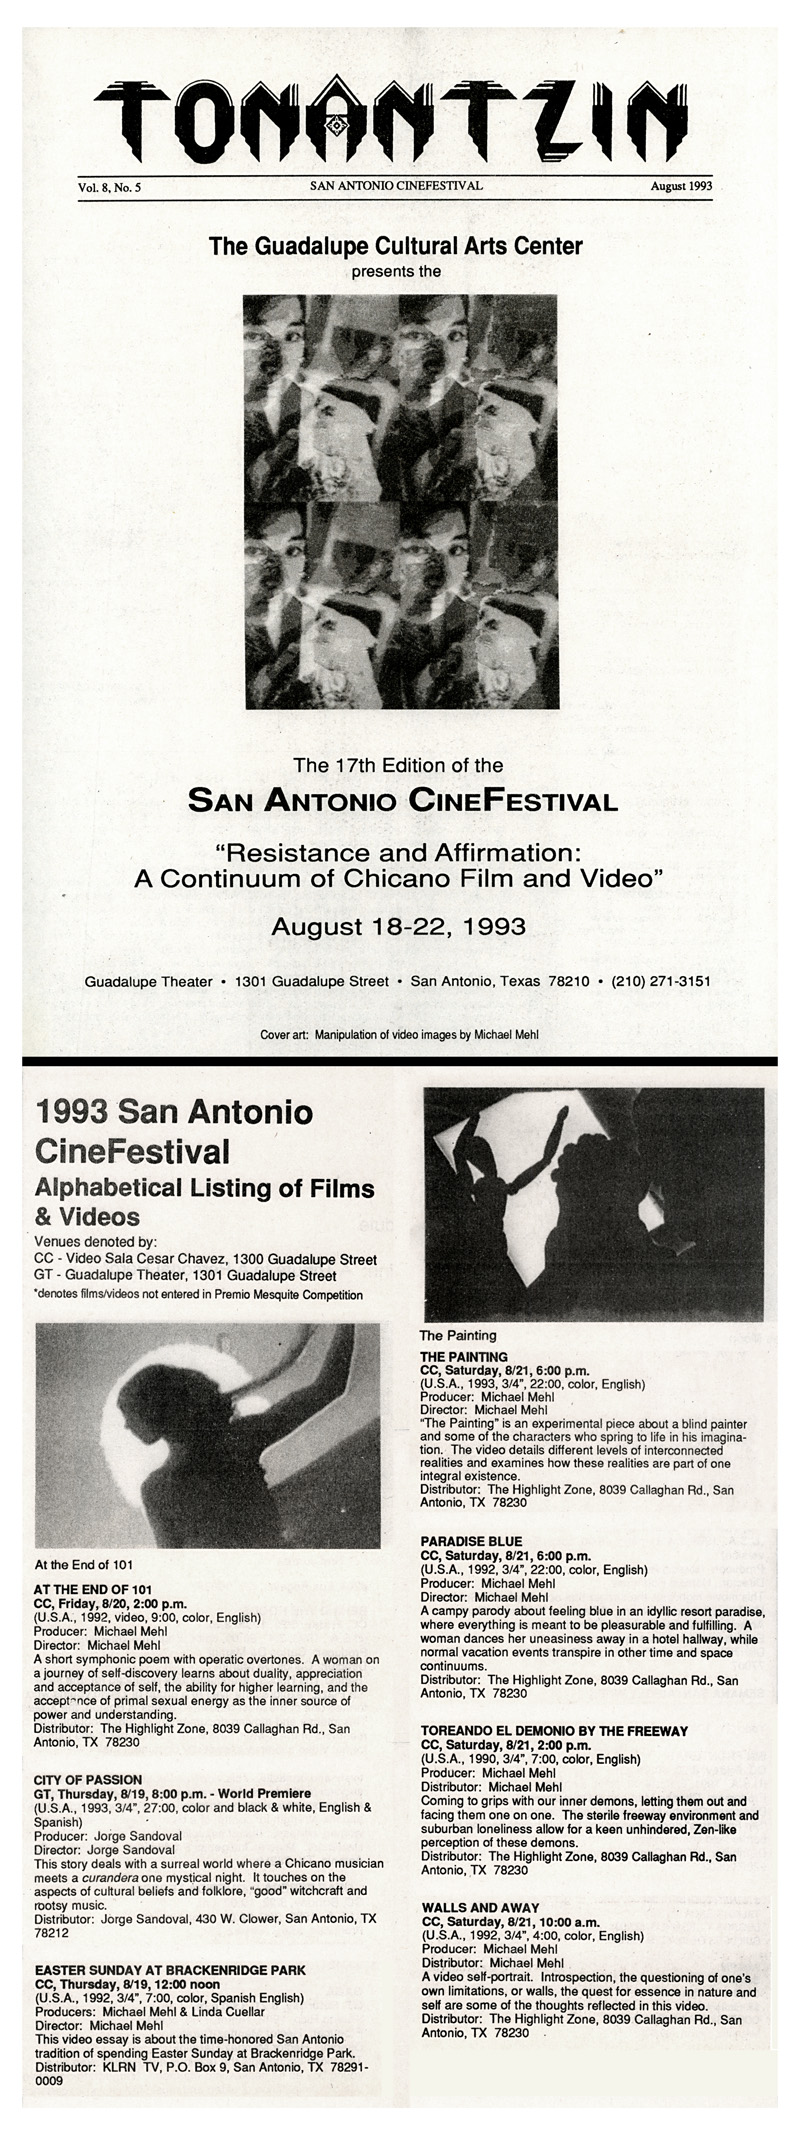 1993_Michael-Mehl_CineFestival-Video-Screenings_Guadalupe-Cultural-Center_San-Antonio-TX